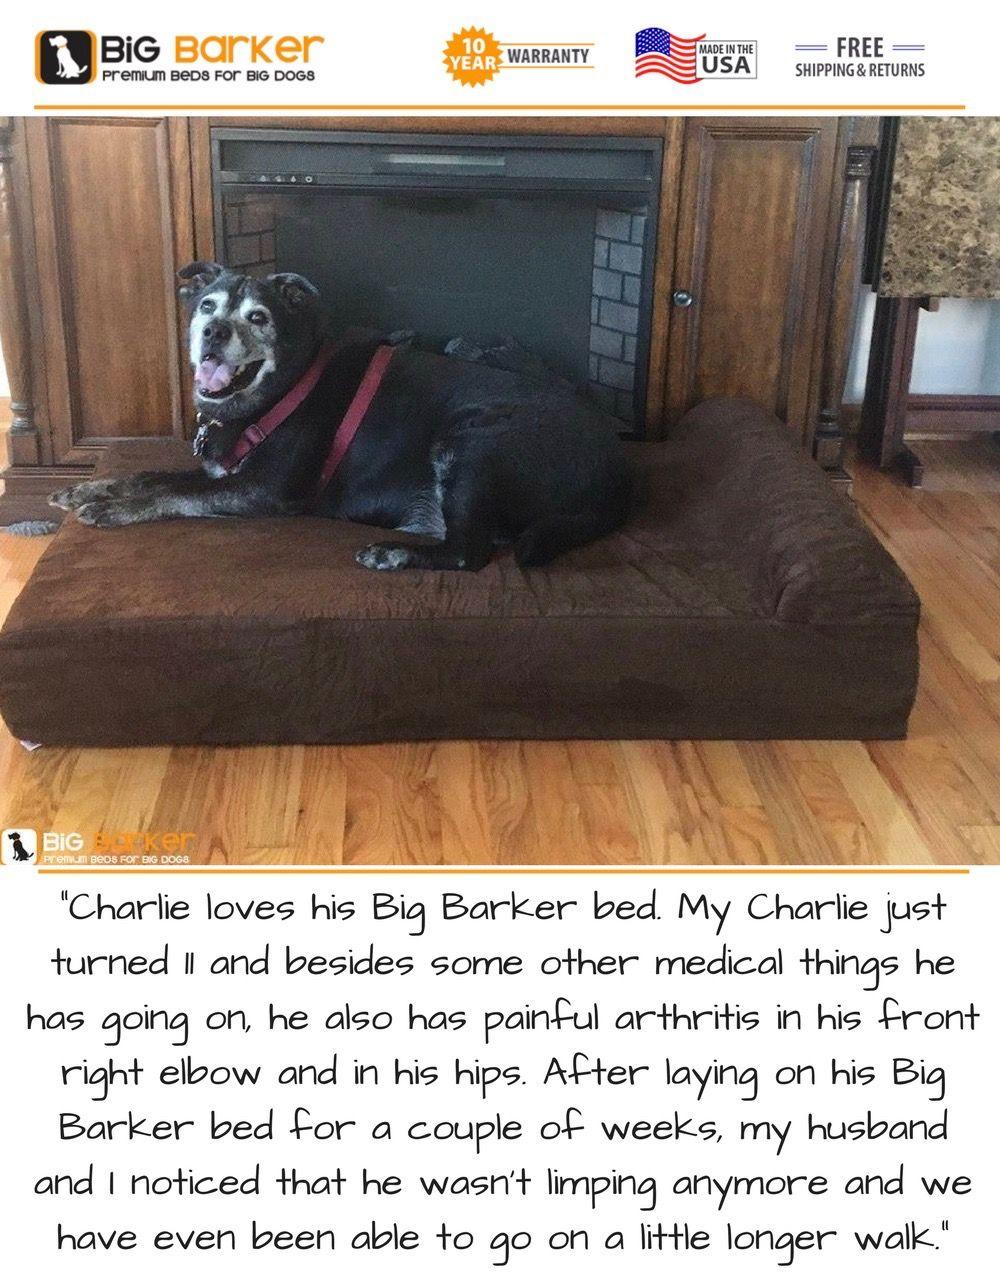 Orthopedic Dog Beds For Large Extra Large Dogs Big Dog Beds